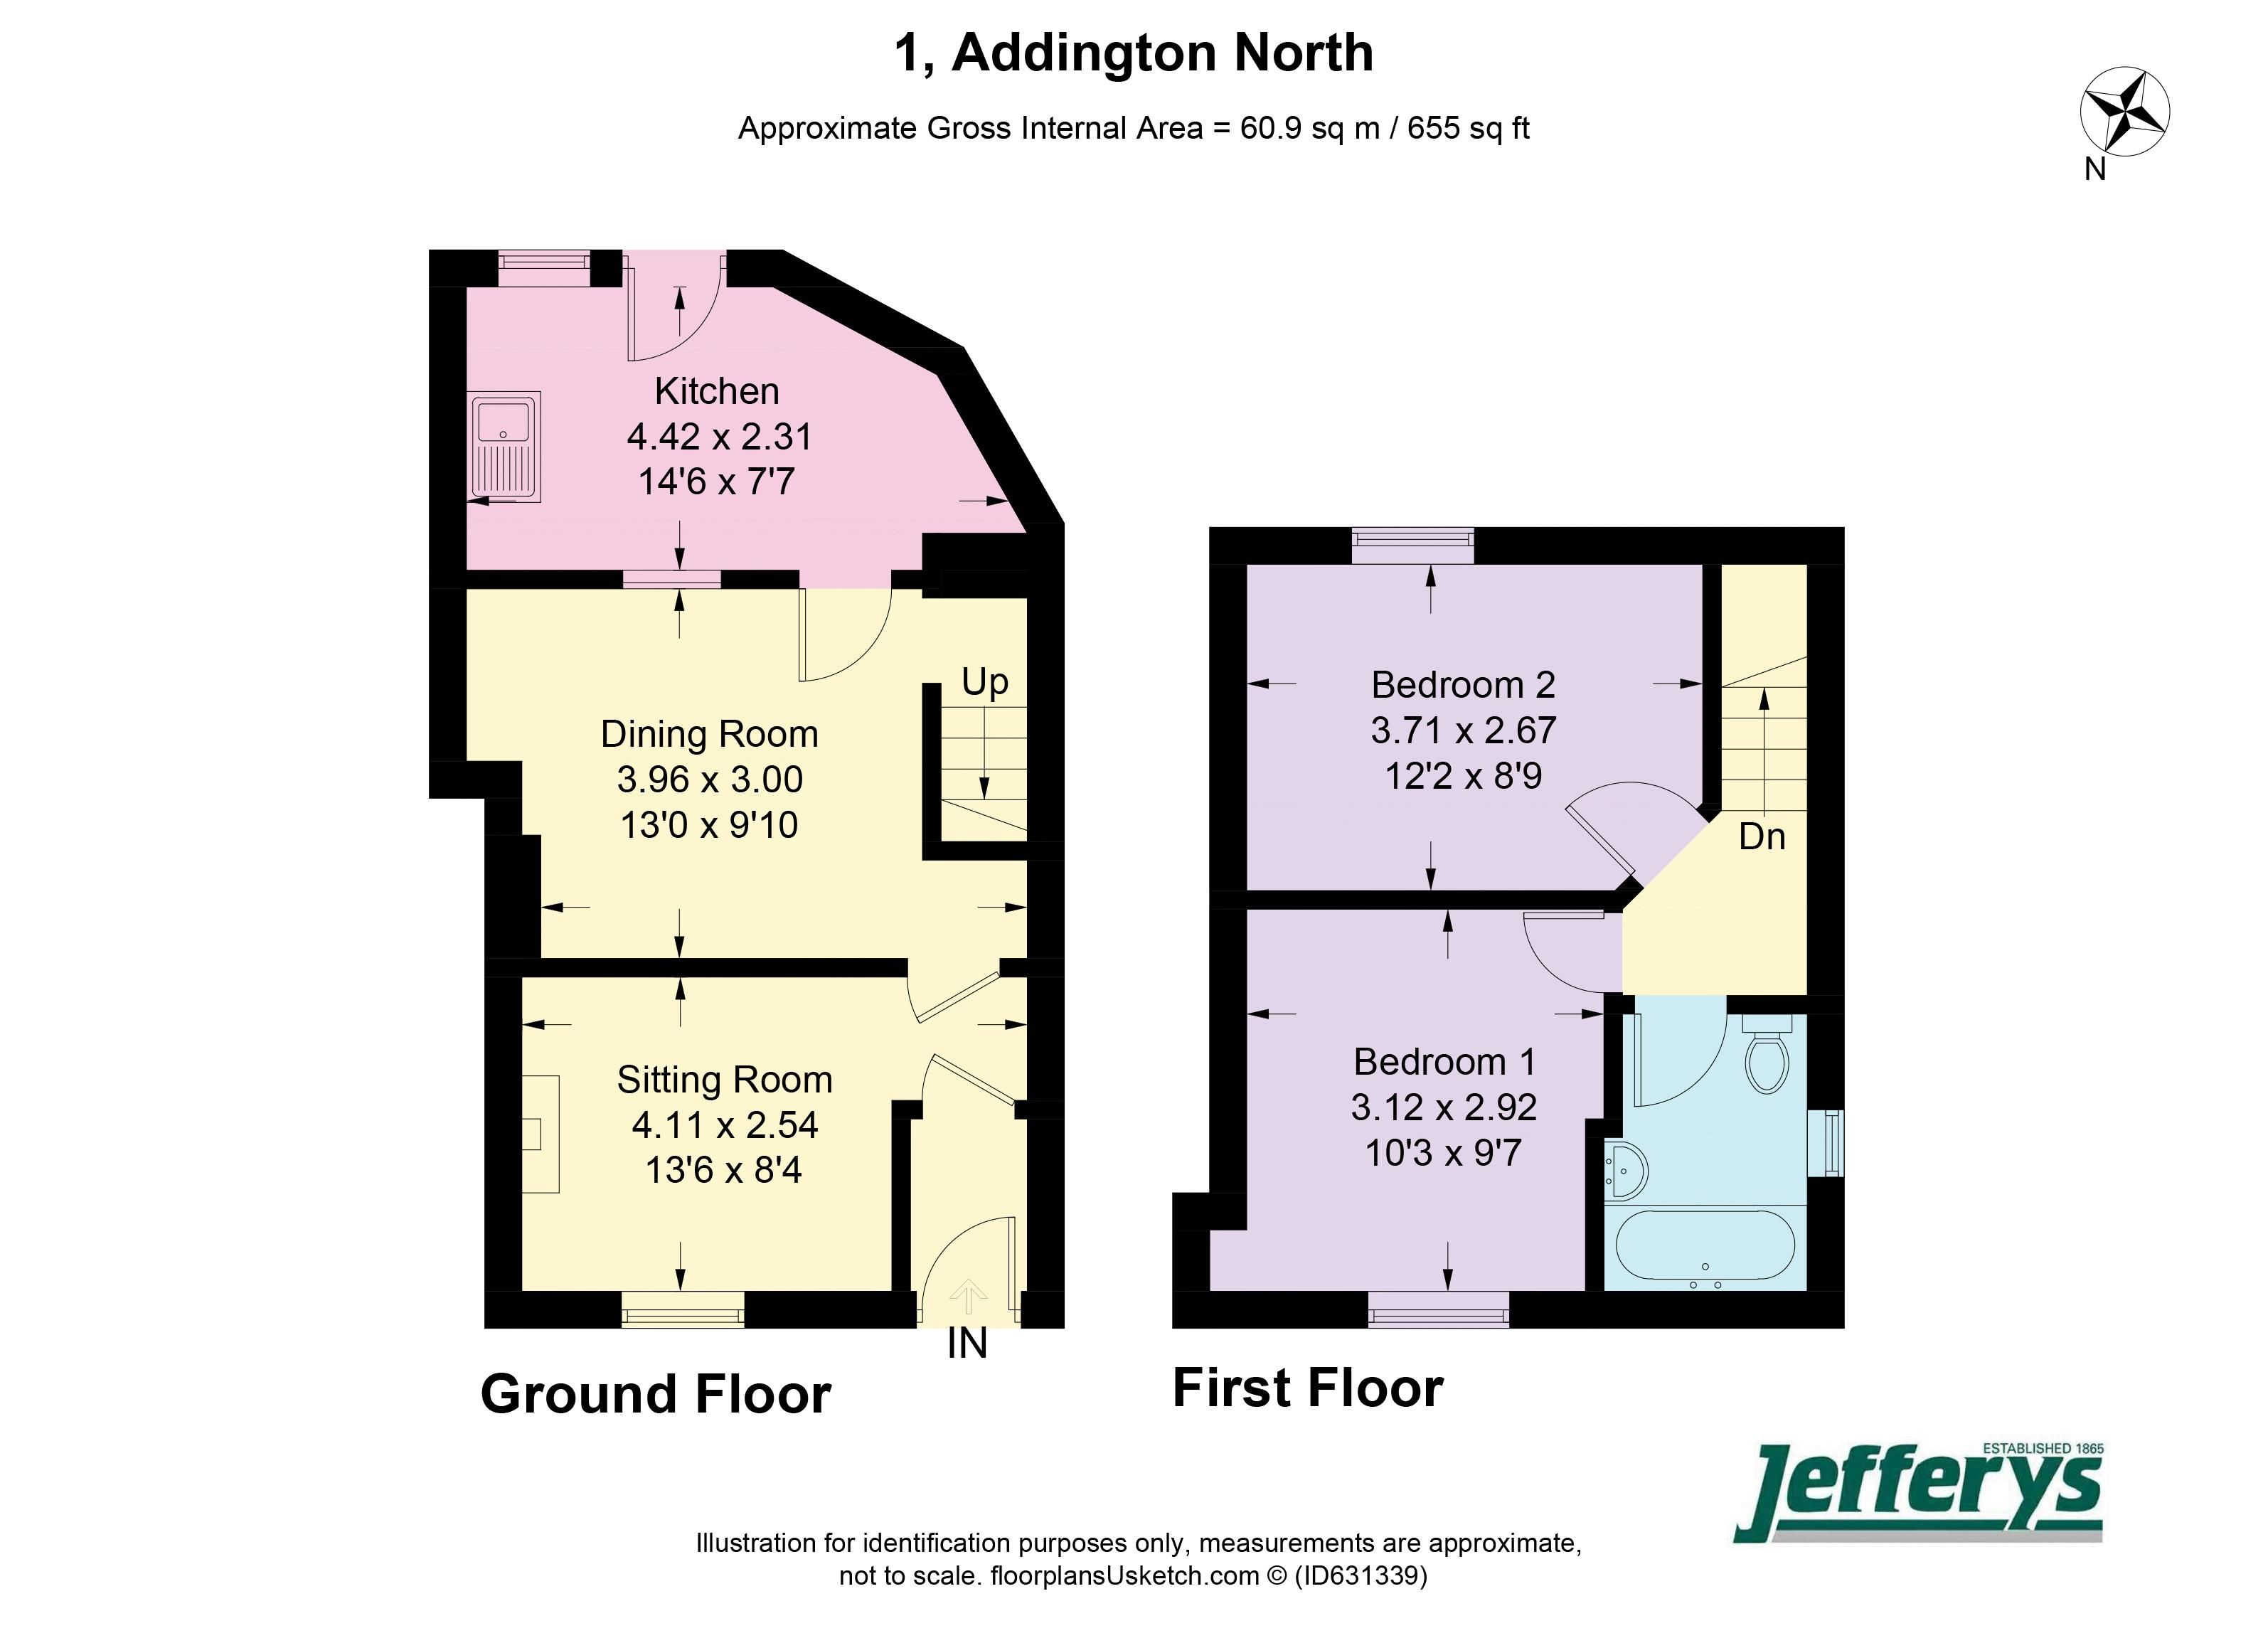 Addington North